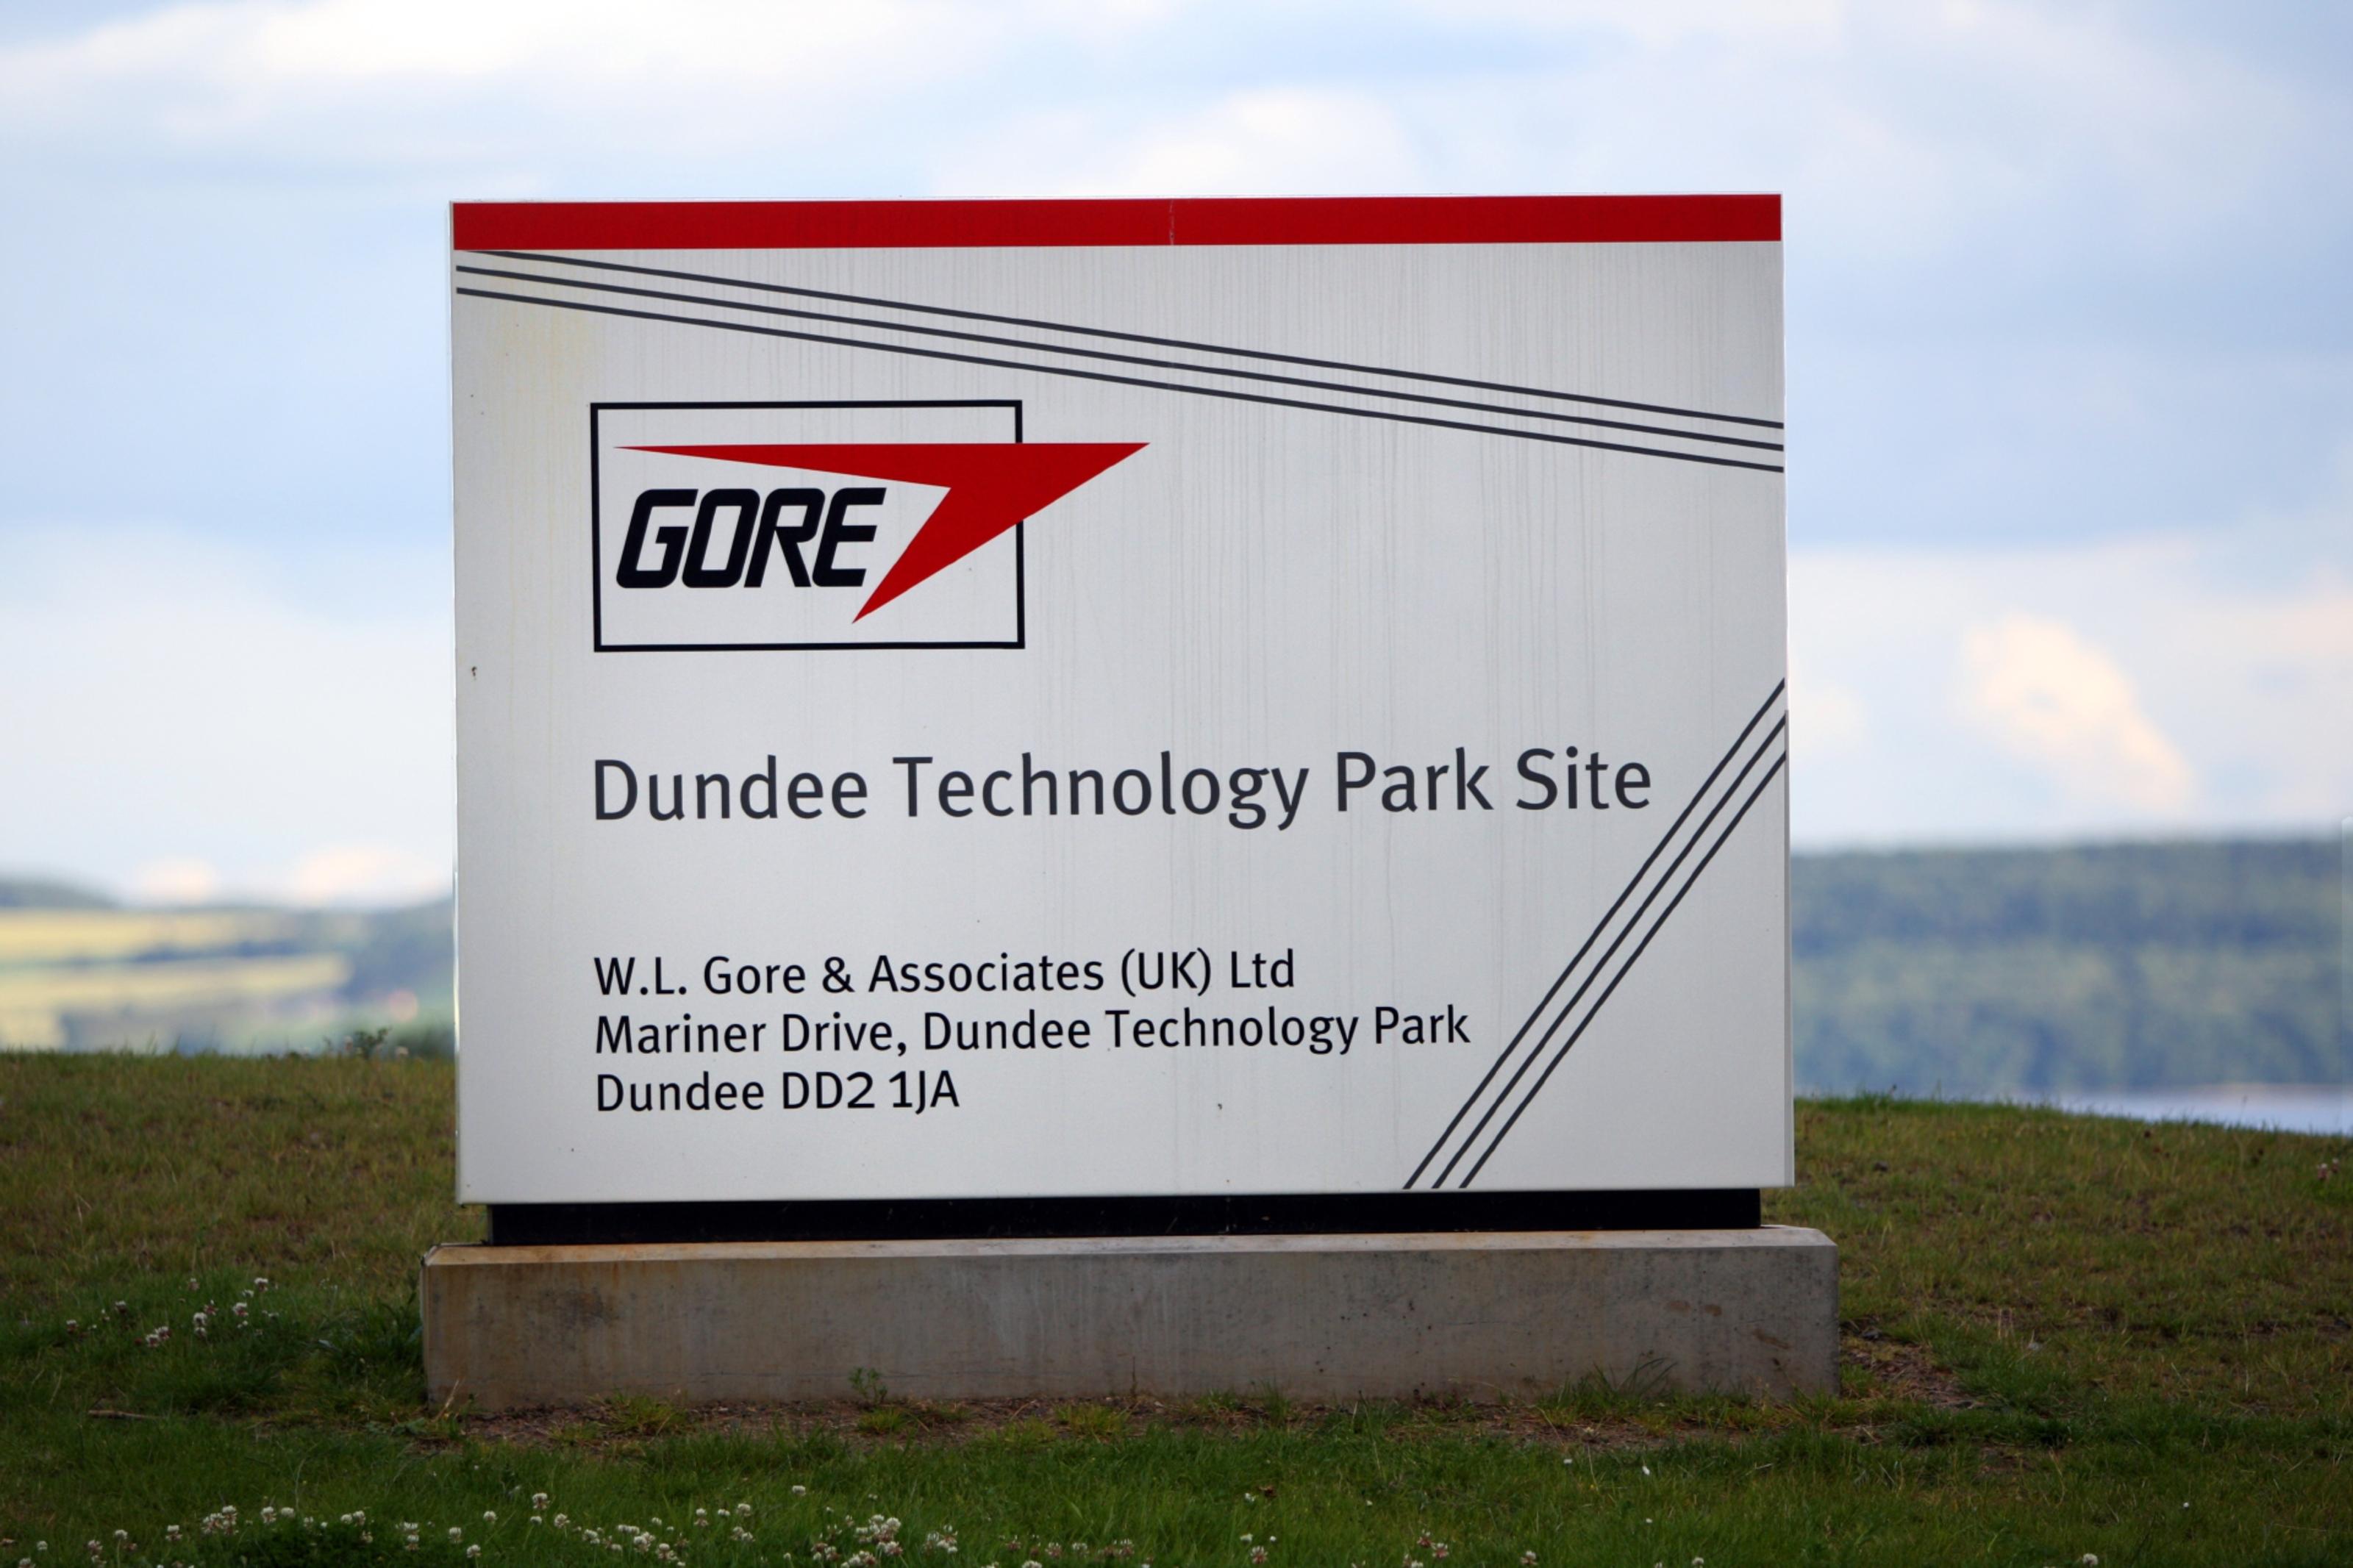 WL Gore & Associates (UK) Ltd, site at Mariner Drive, Dundee Technology Park.